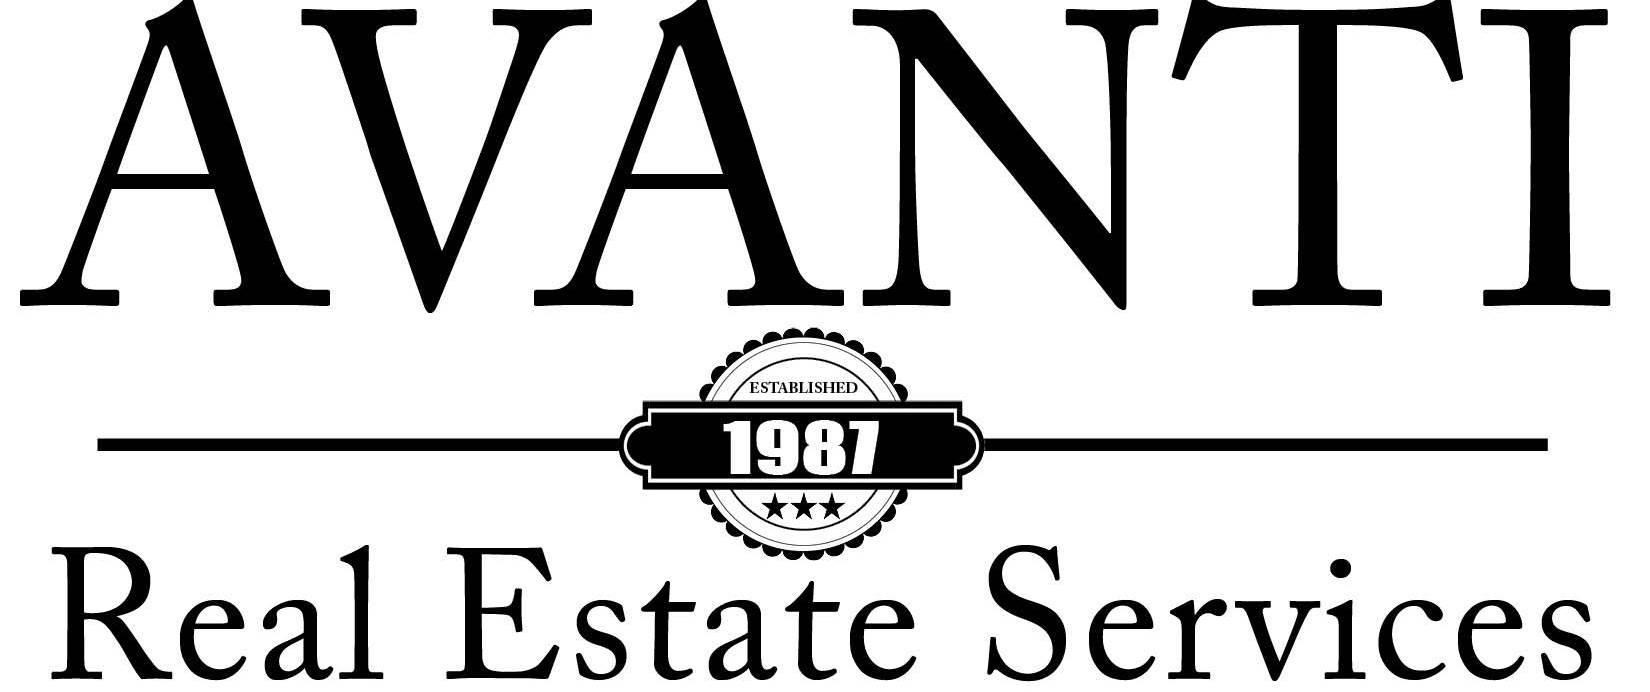 AVANTI Real Estate Services Type Style Logo - Copy